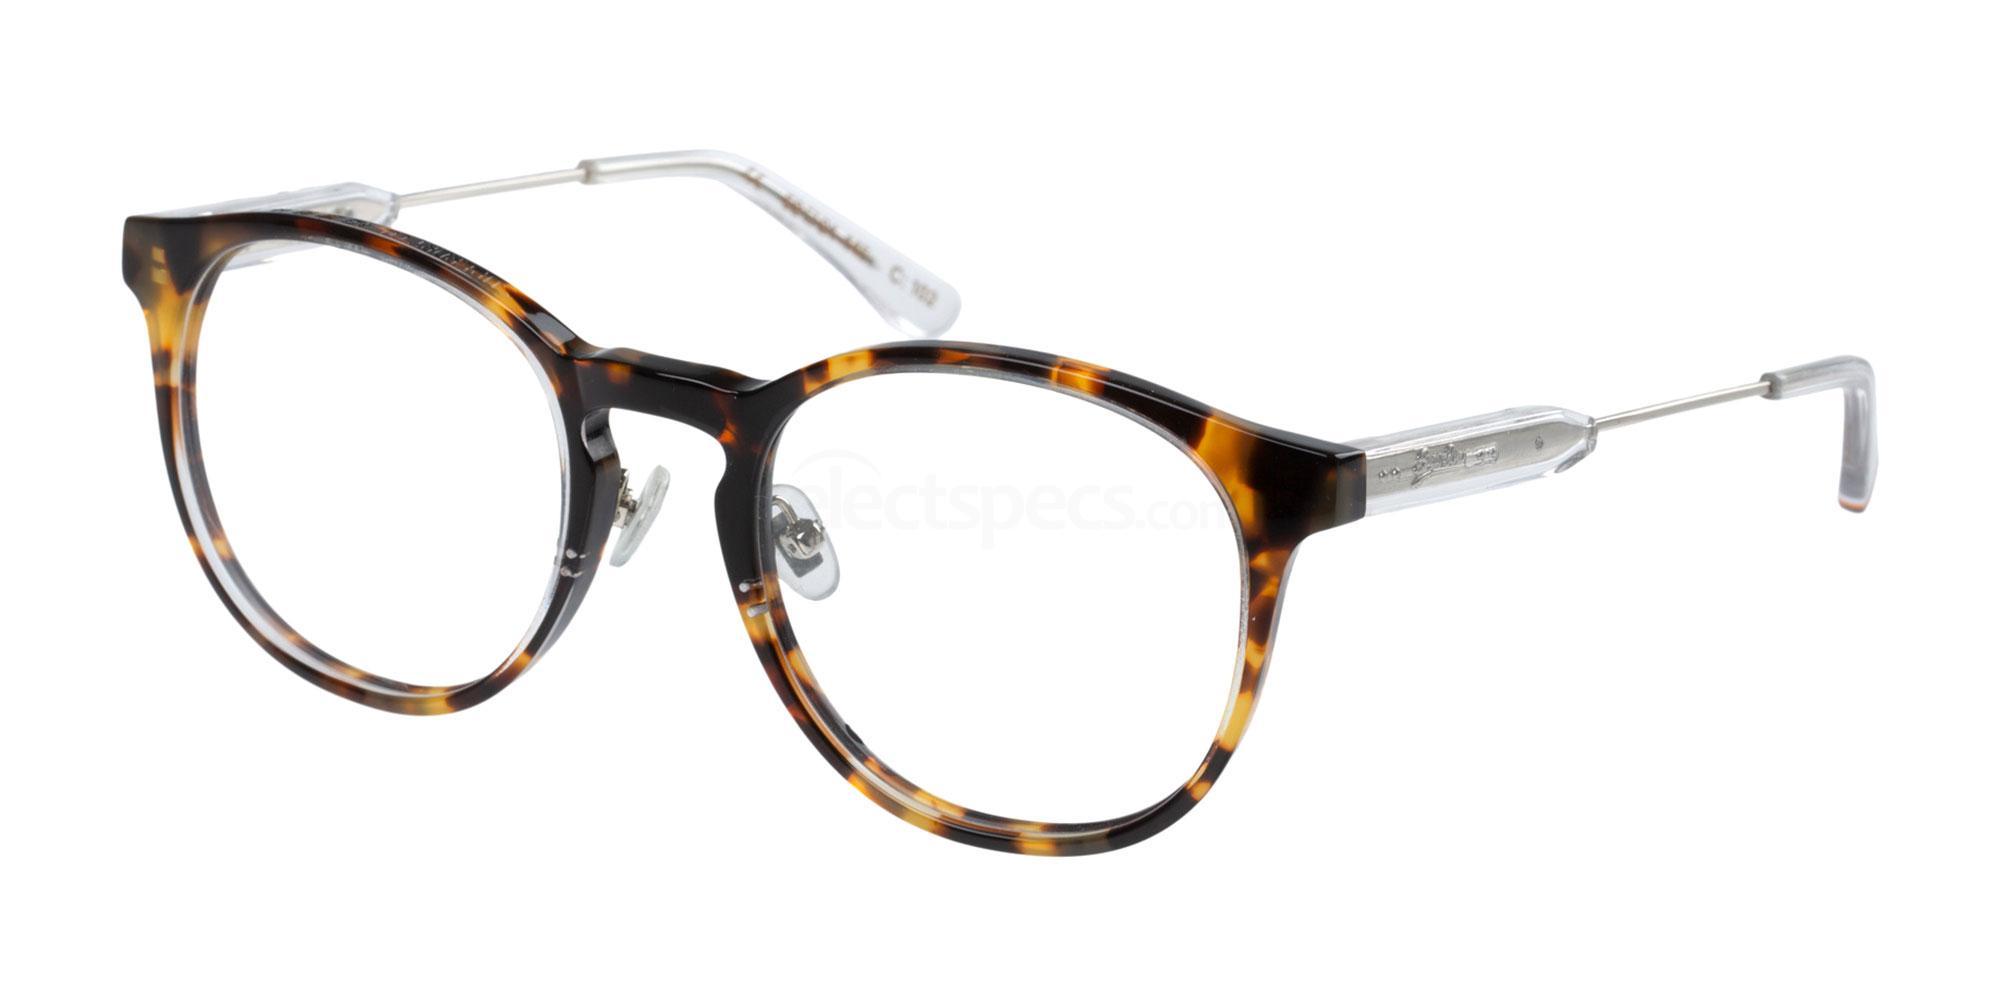 102 SDO-FREEWAY Glasses, Superdry